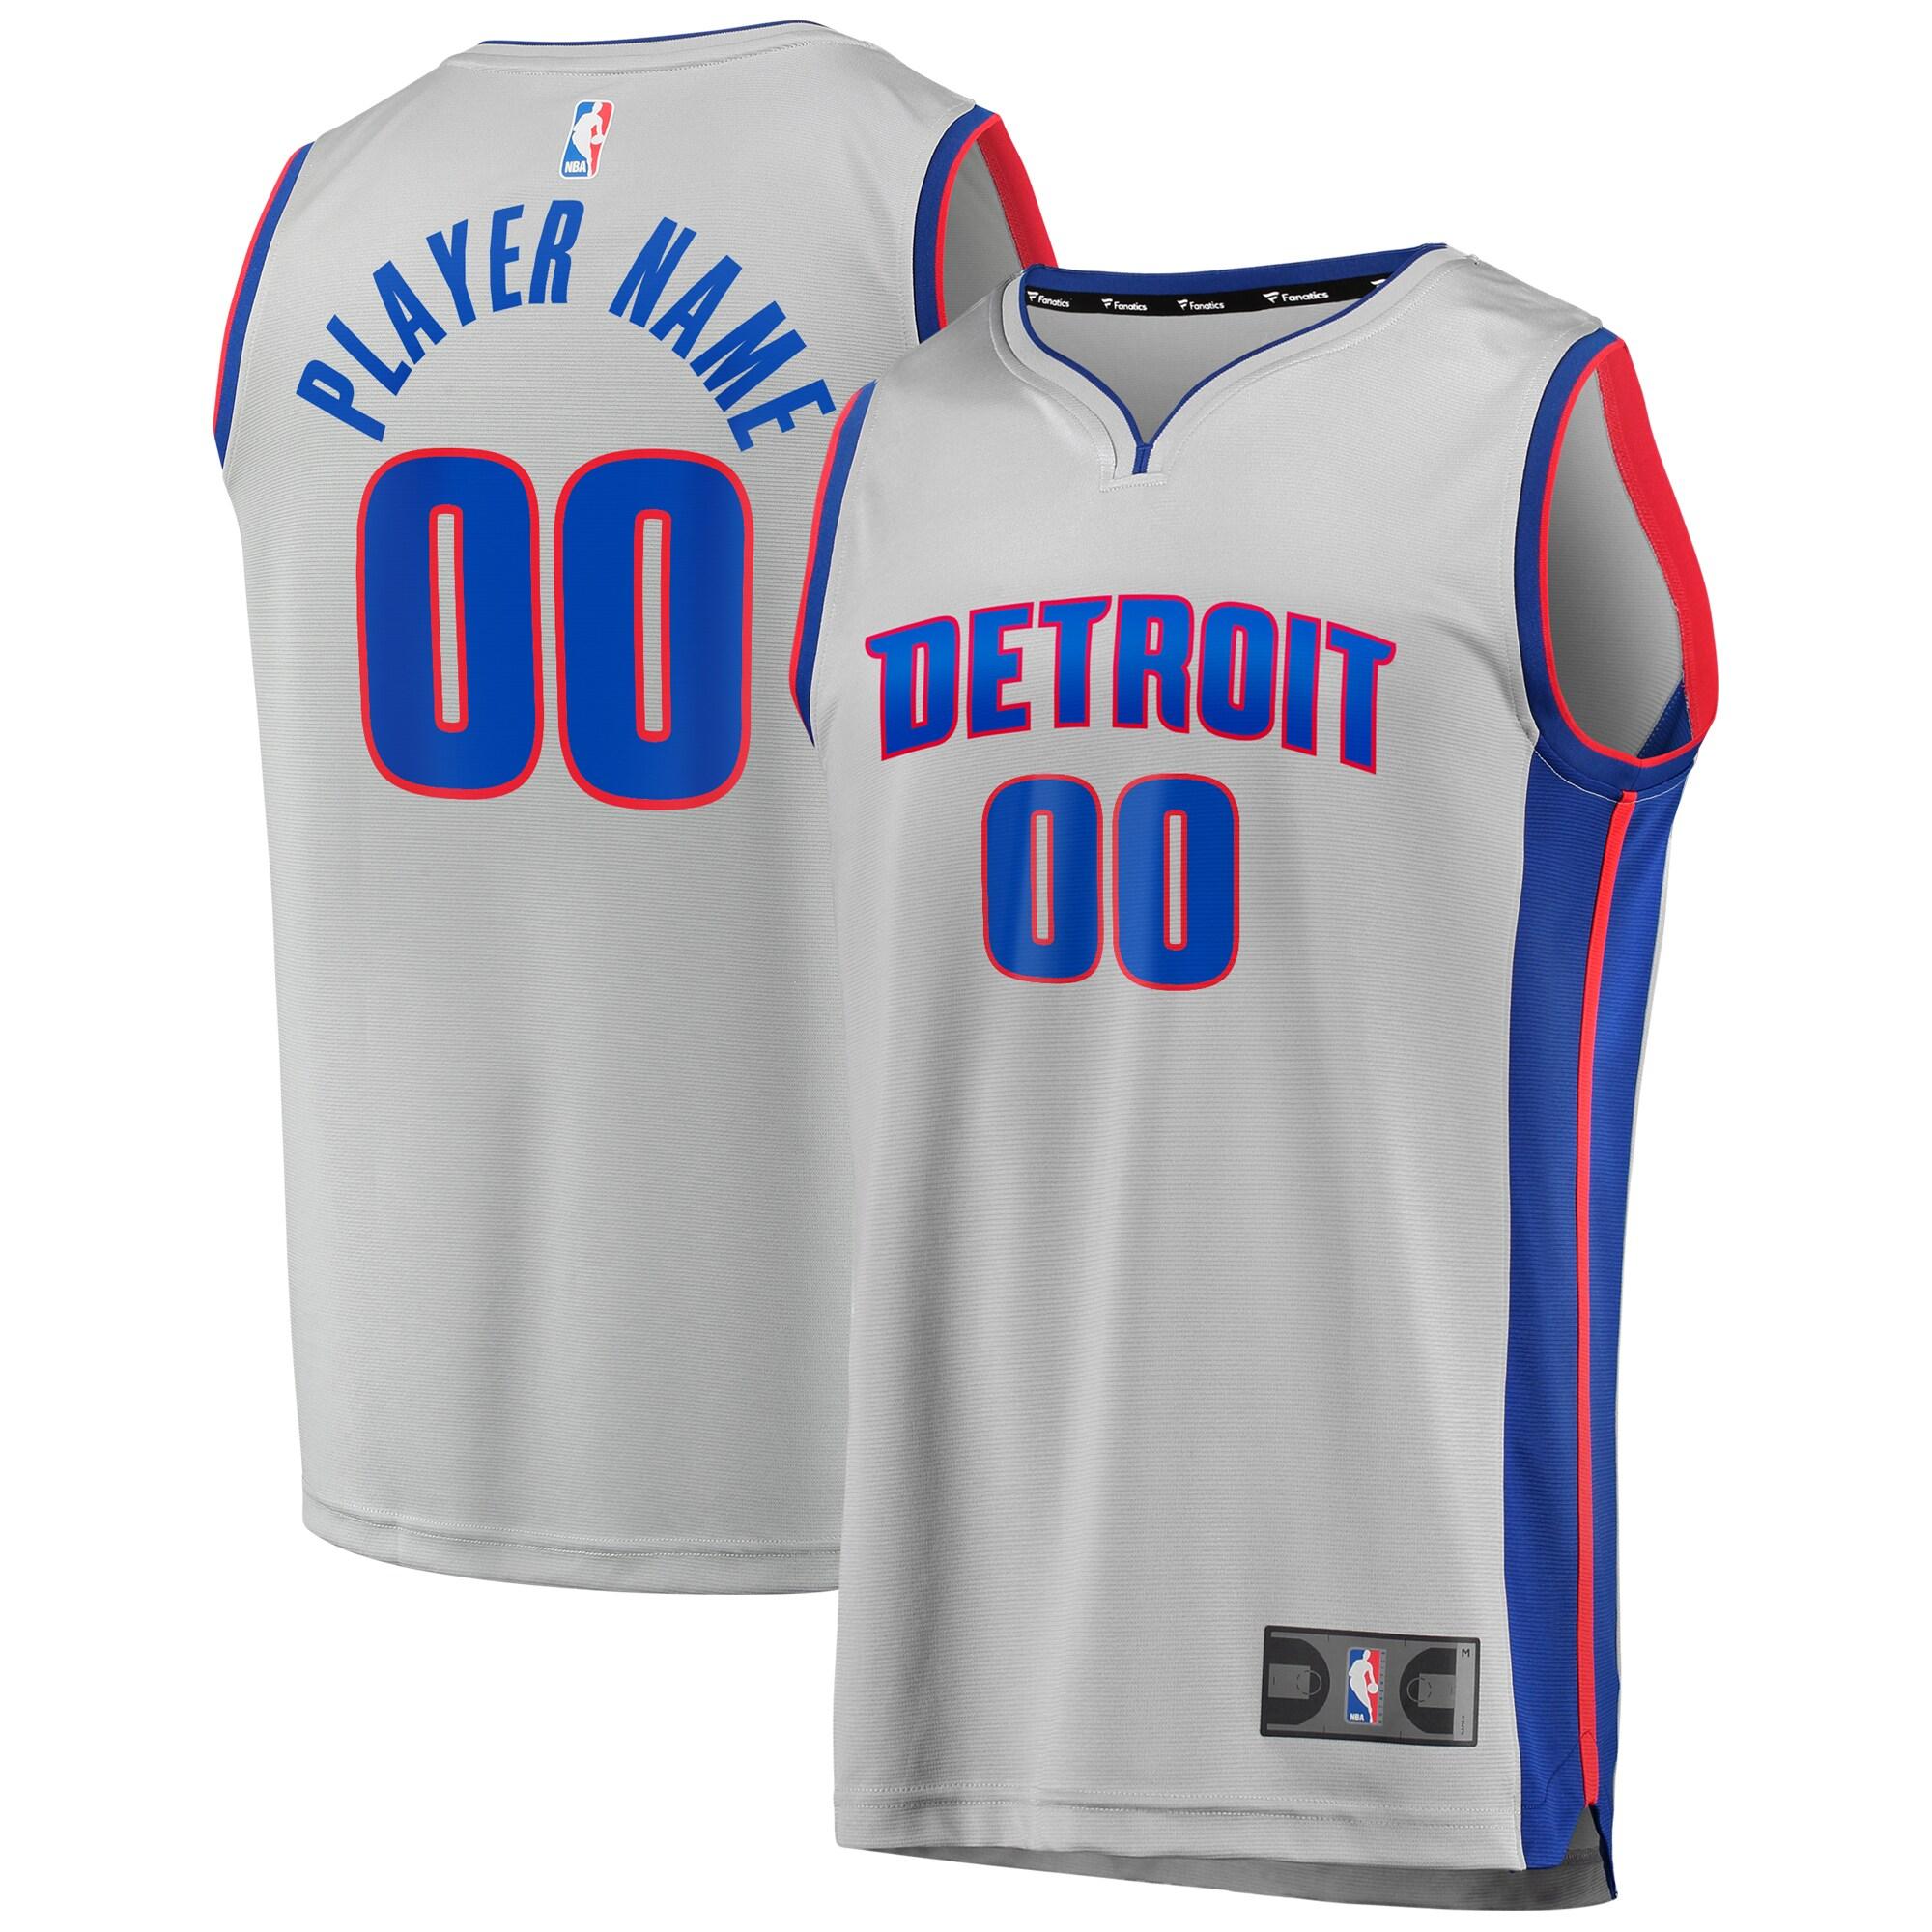 Detroit Pistons Fanatics Branded Fast Break Custom Replica Jersey Gray - Statement Edition